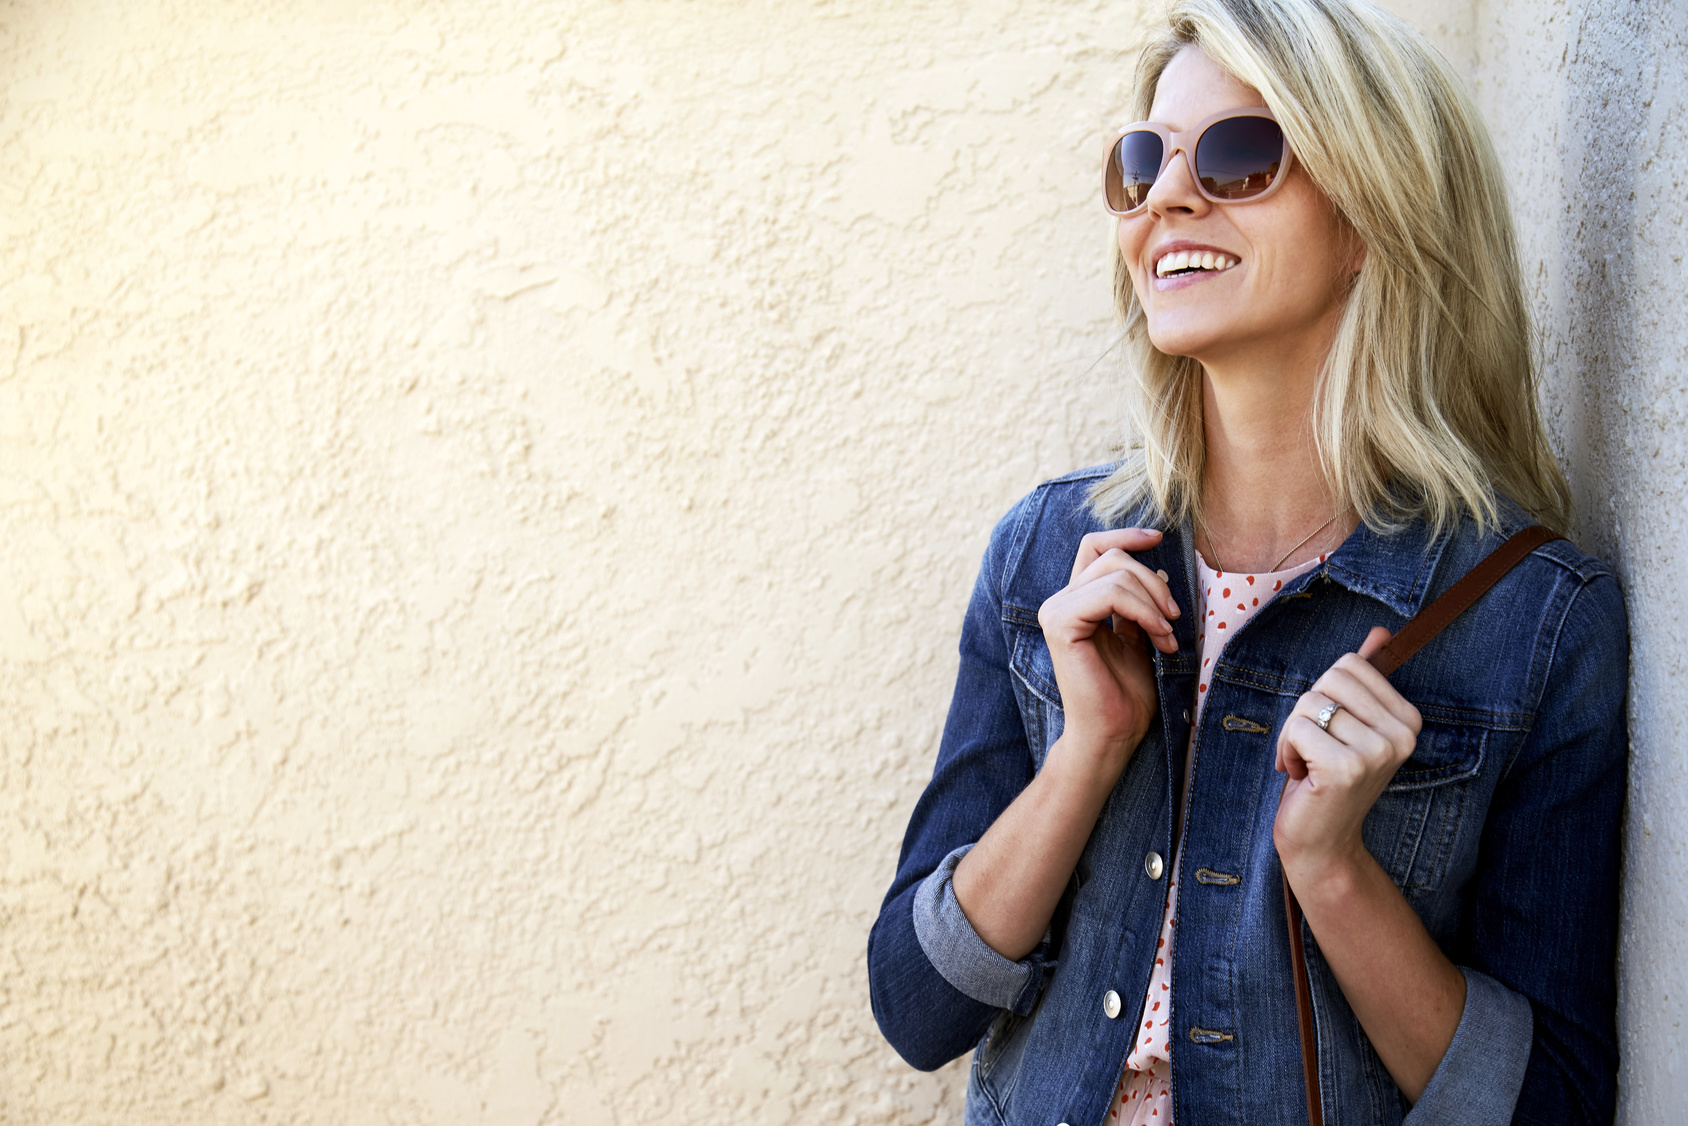 Happy blond woman